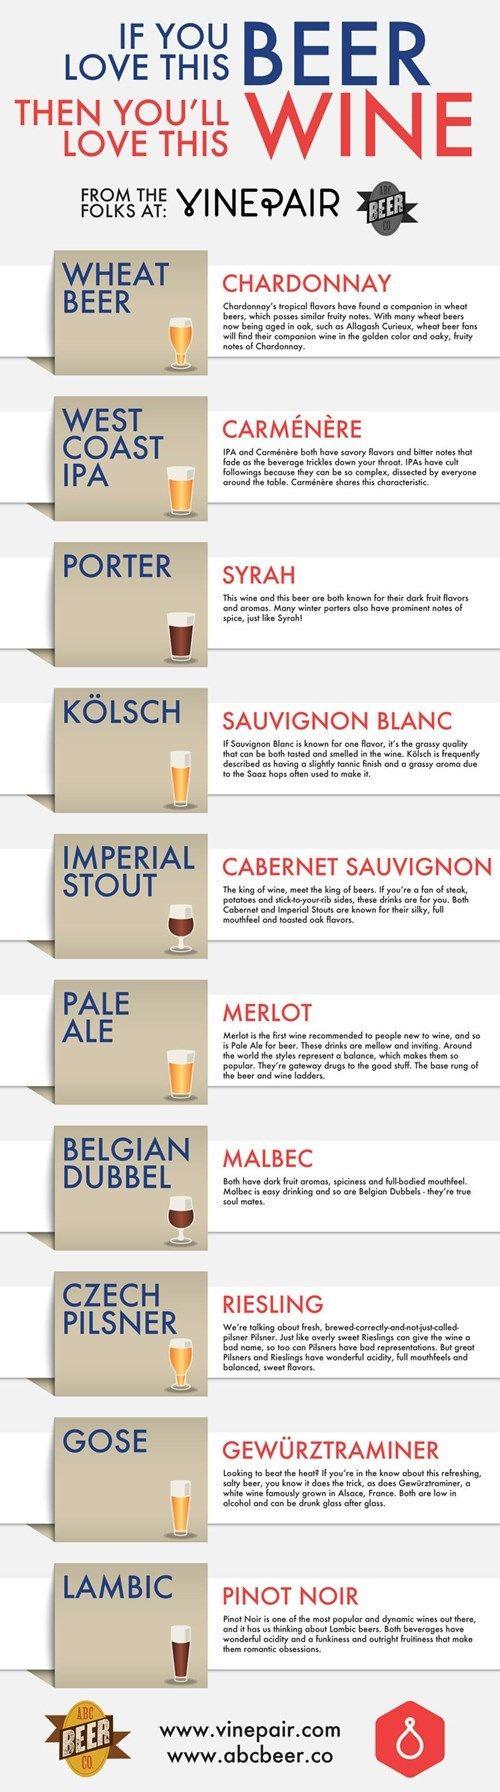 Choosing wines according to the beers you like